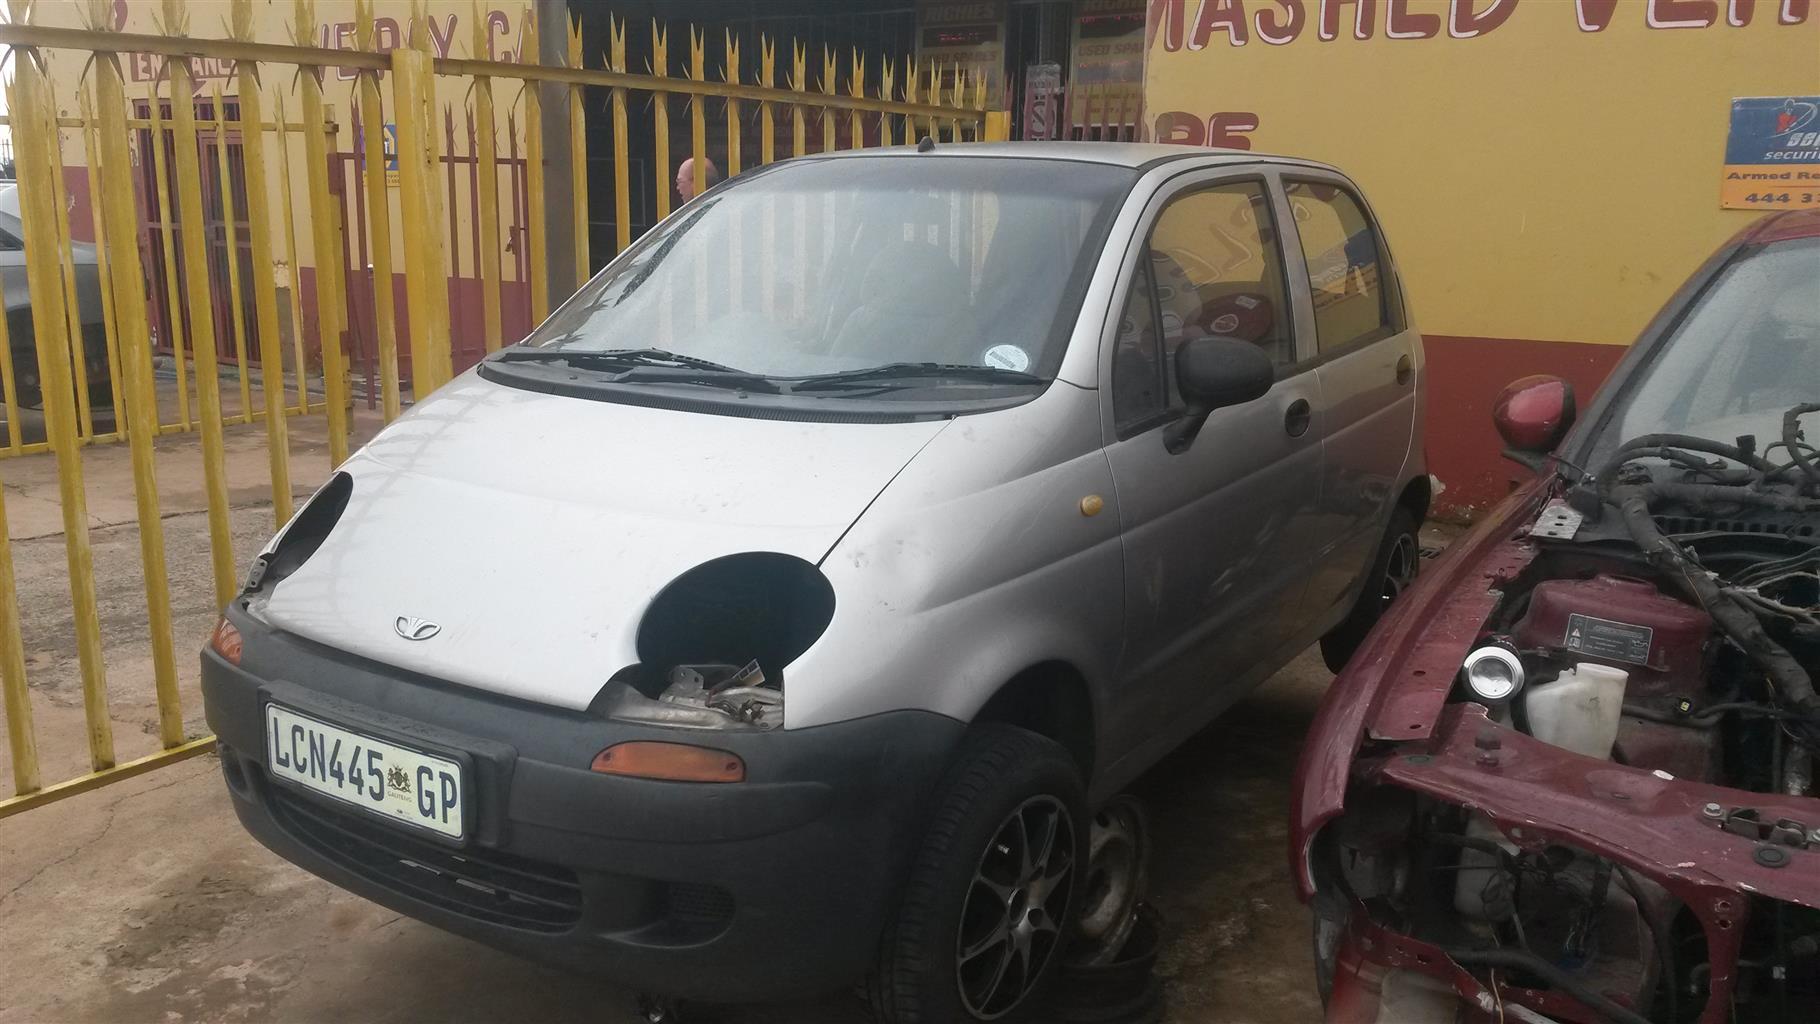 Daewoo matiz stripping for spares | Junk Mail